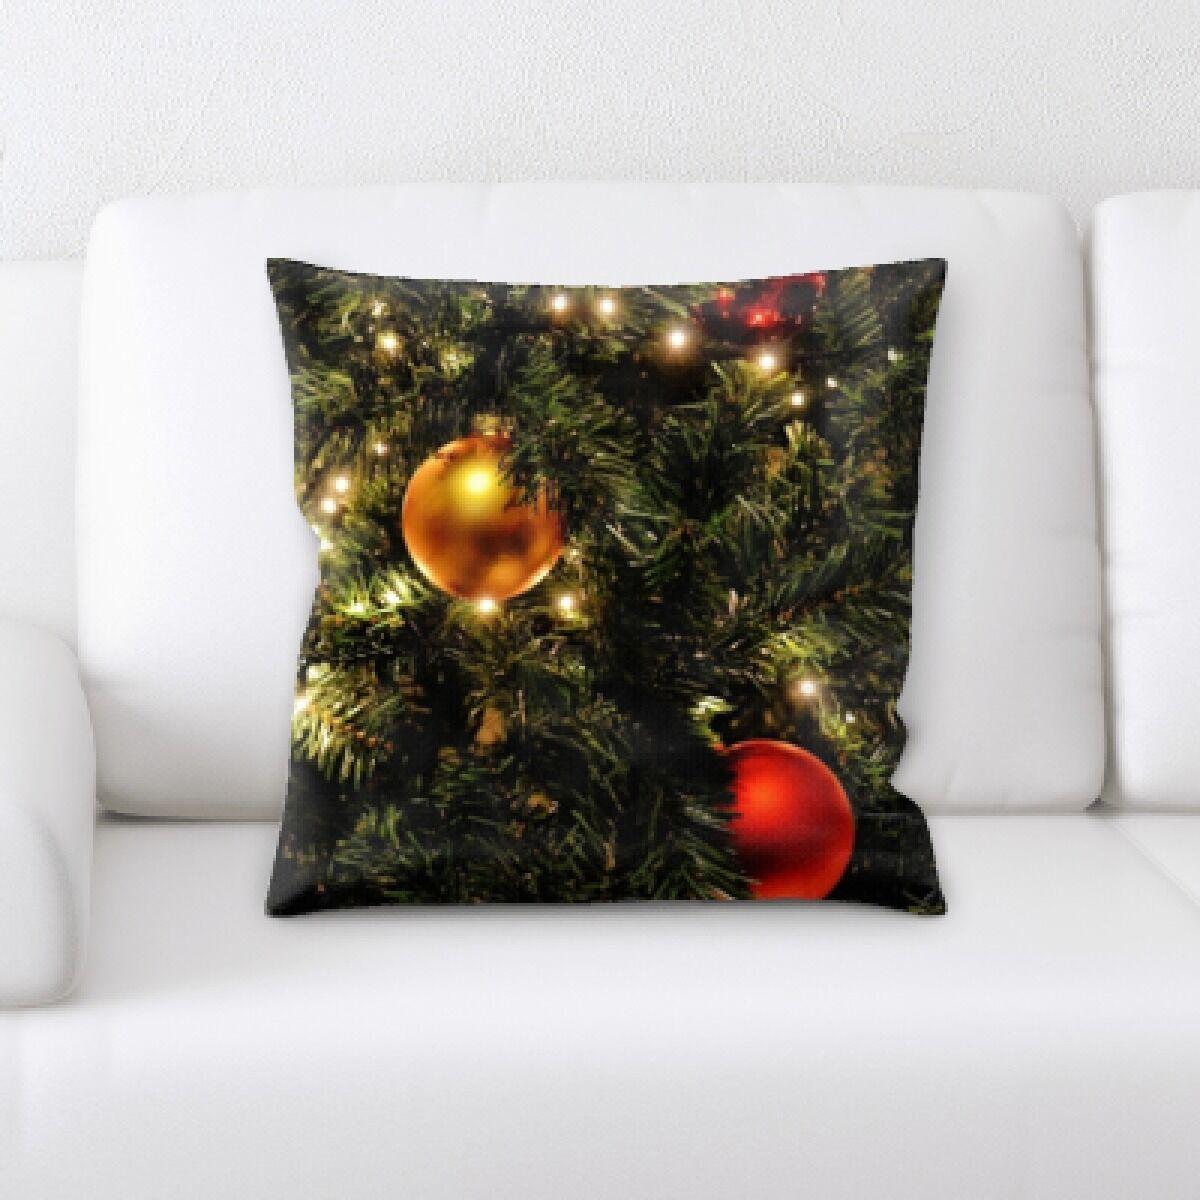 Congo Christmas Decorations (1) Throw Pillow